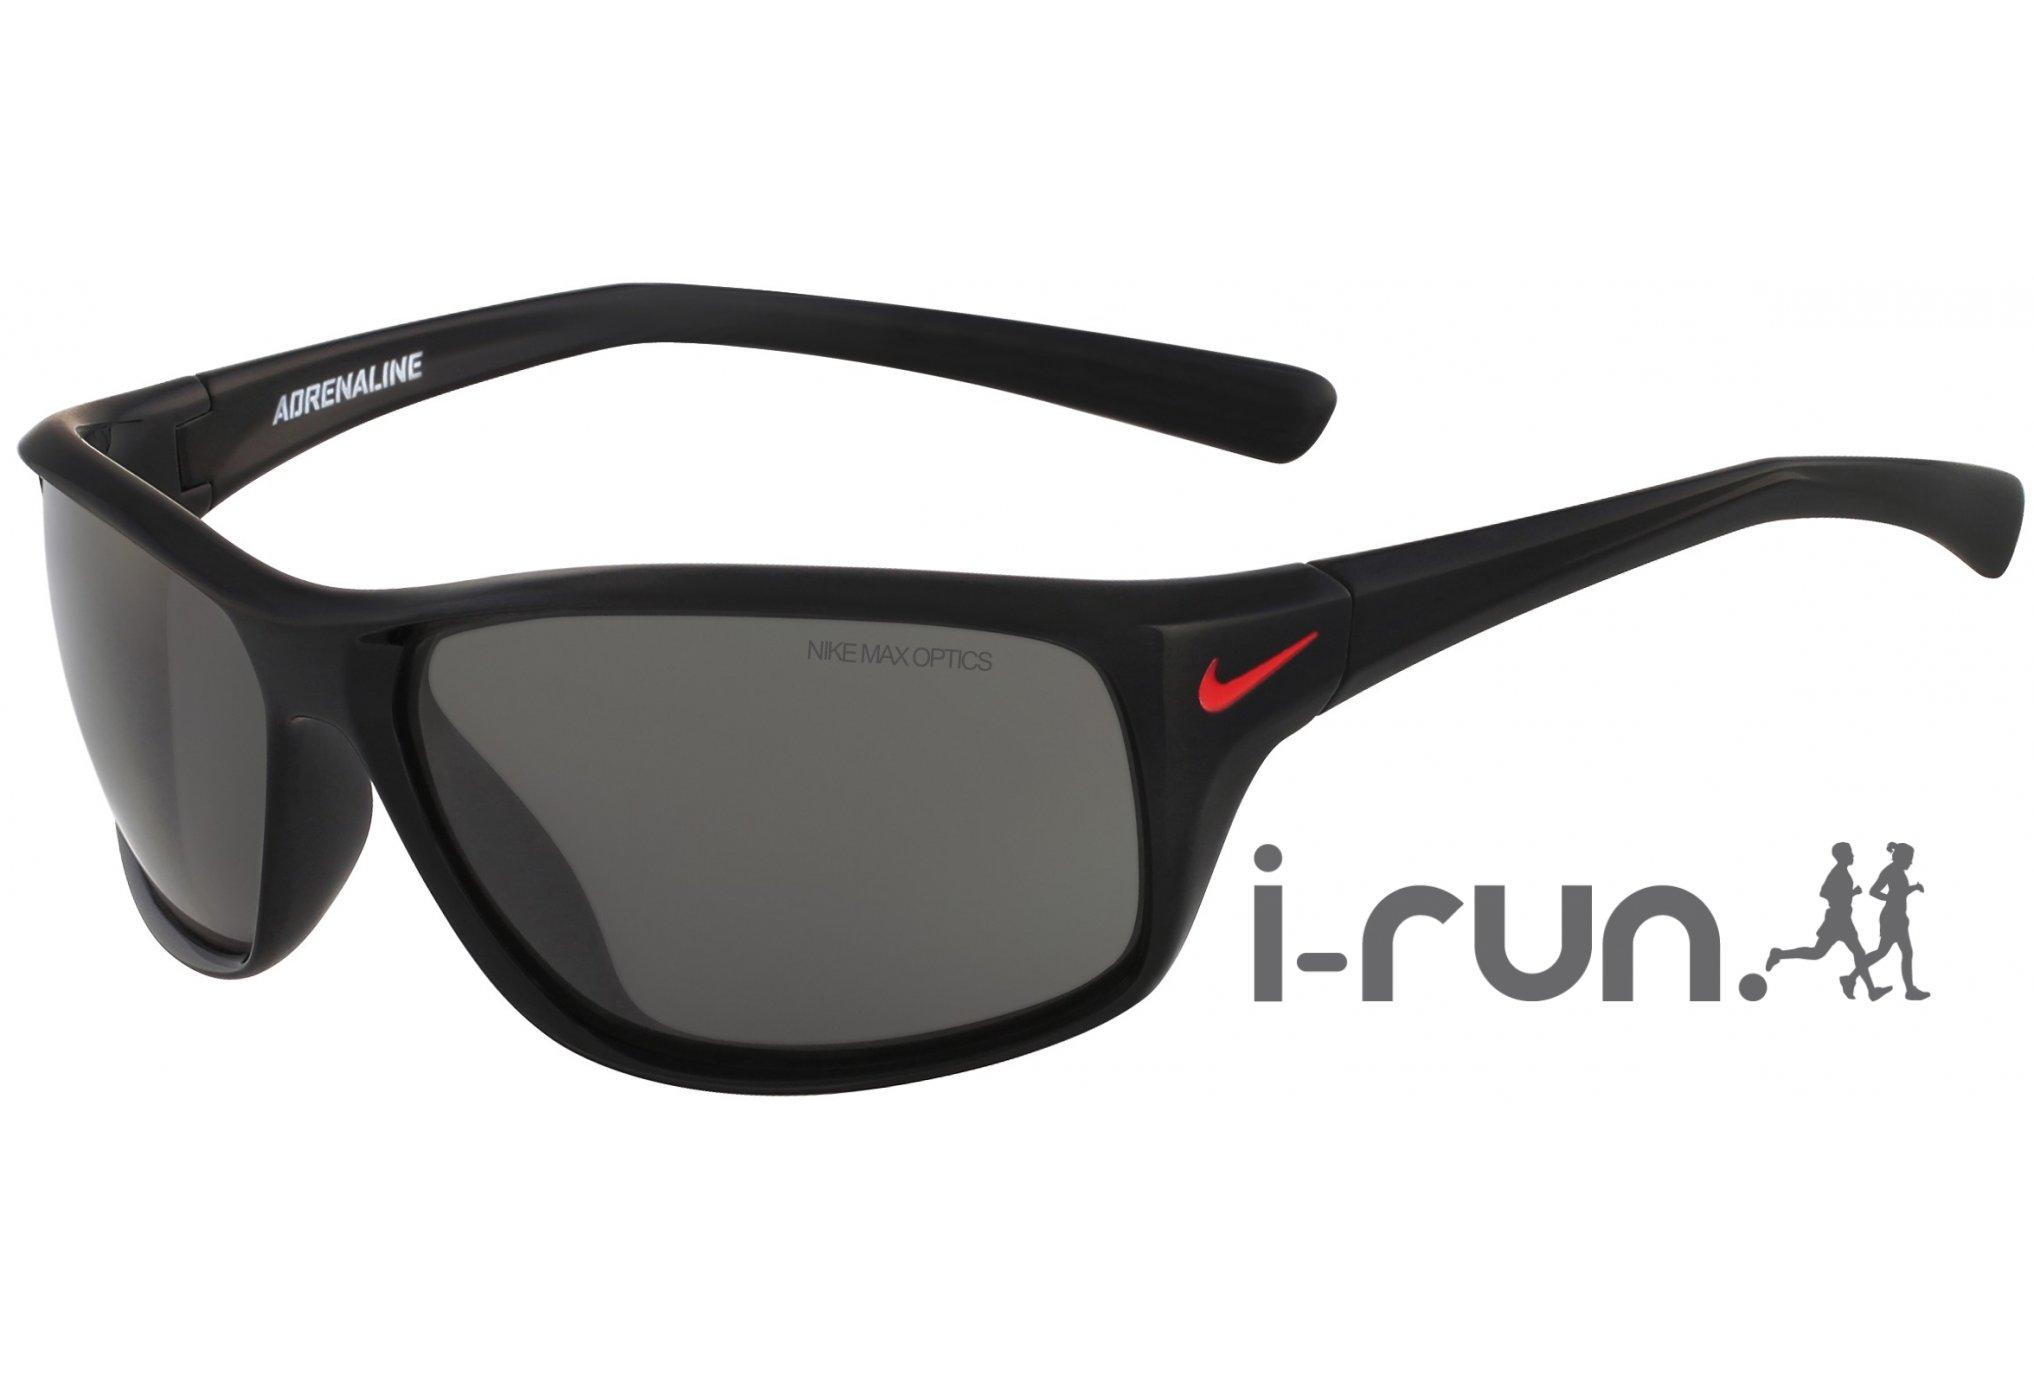 Nike Adrenaline Lunettes